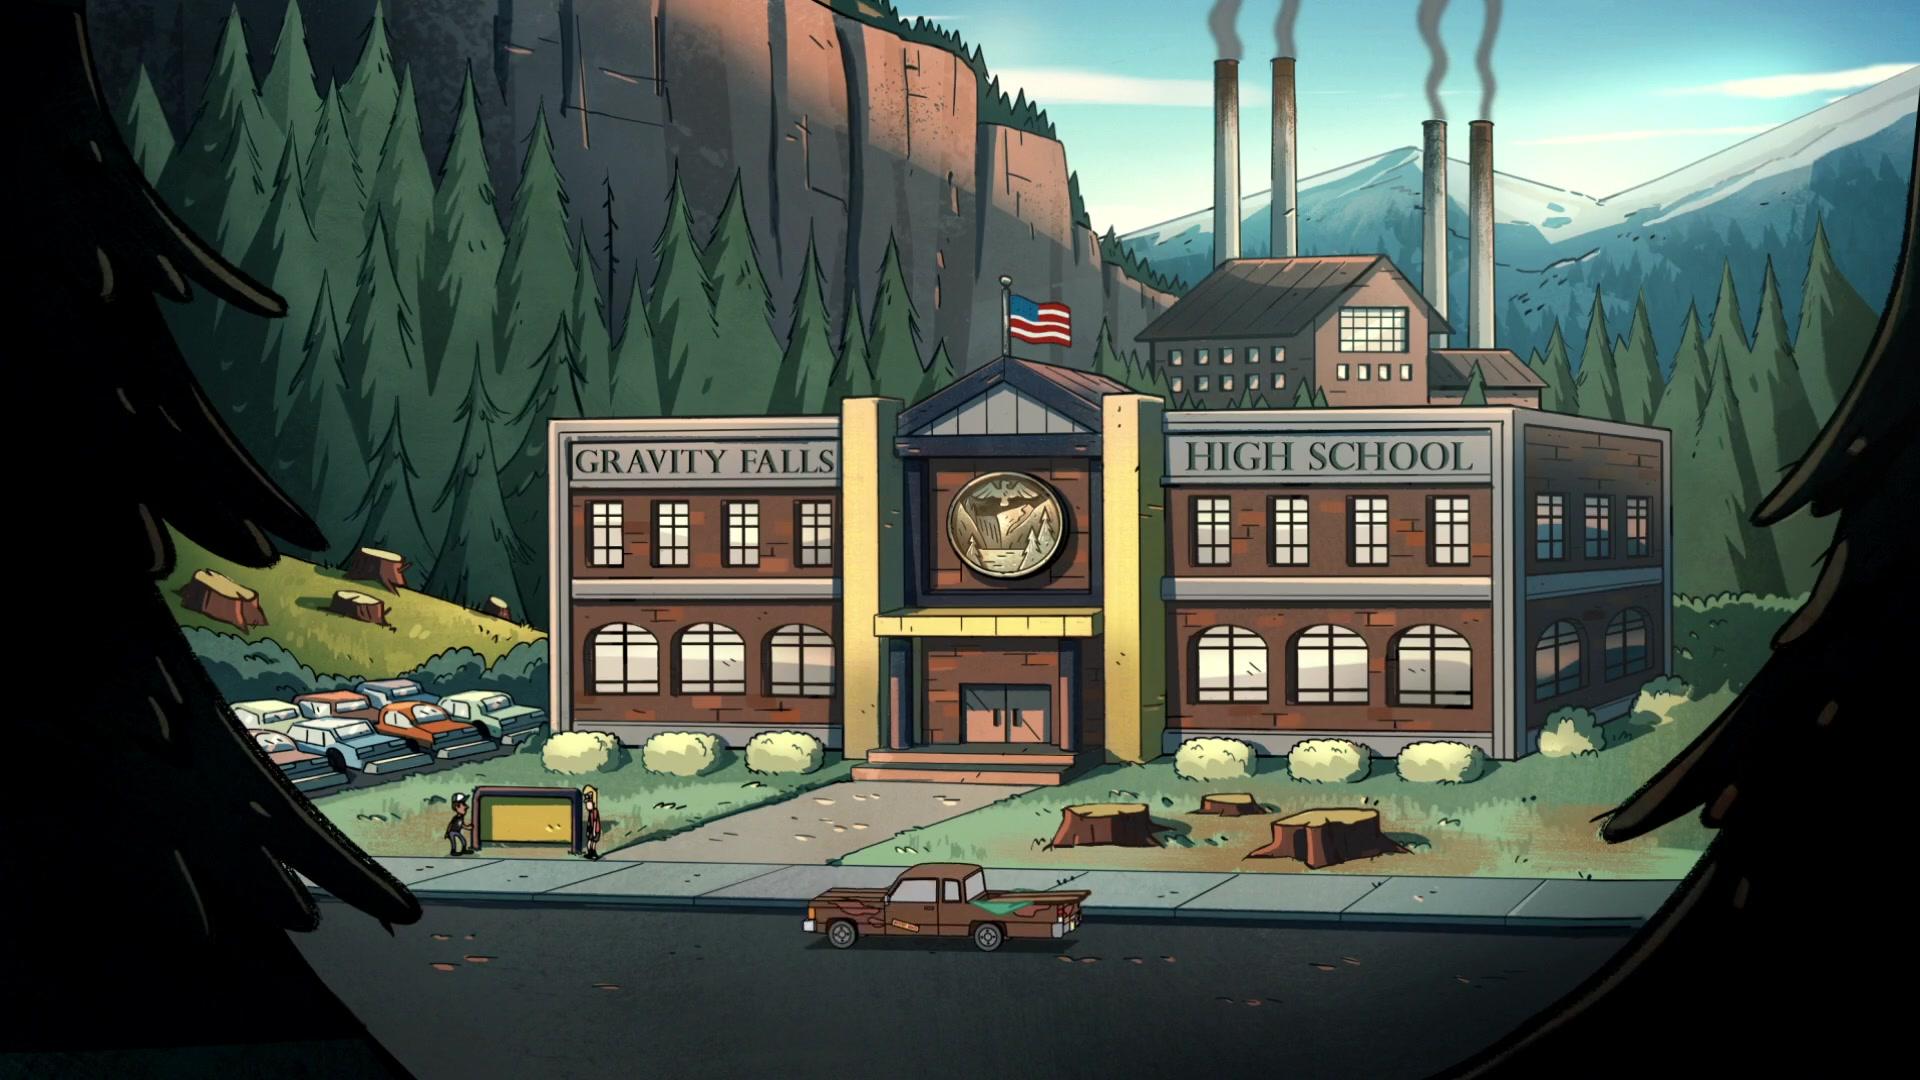 Gravity Falls High School Gravity Falls Wiki Fandom